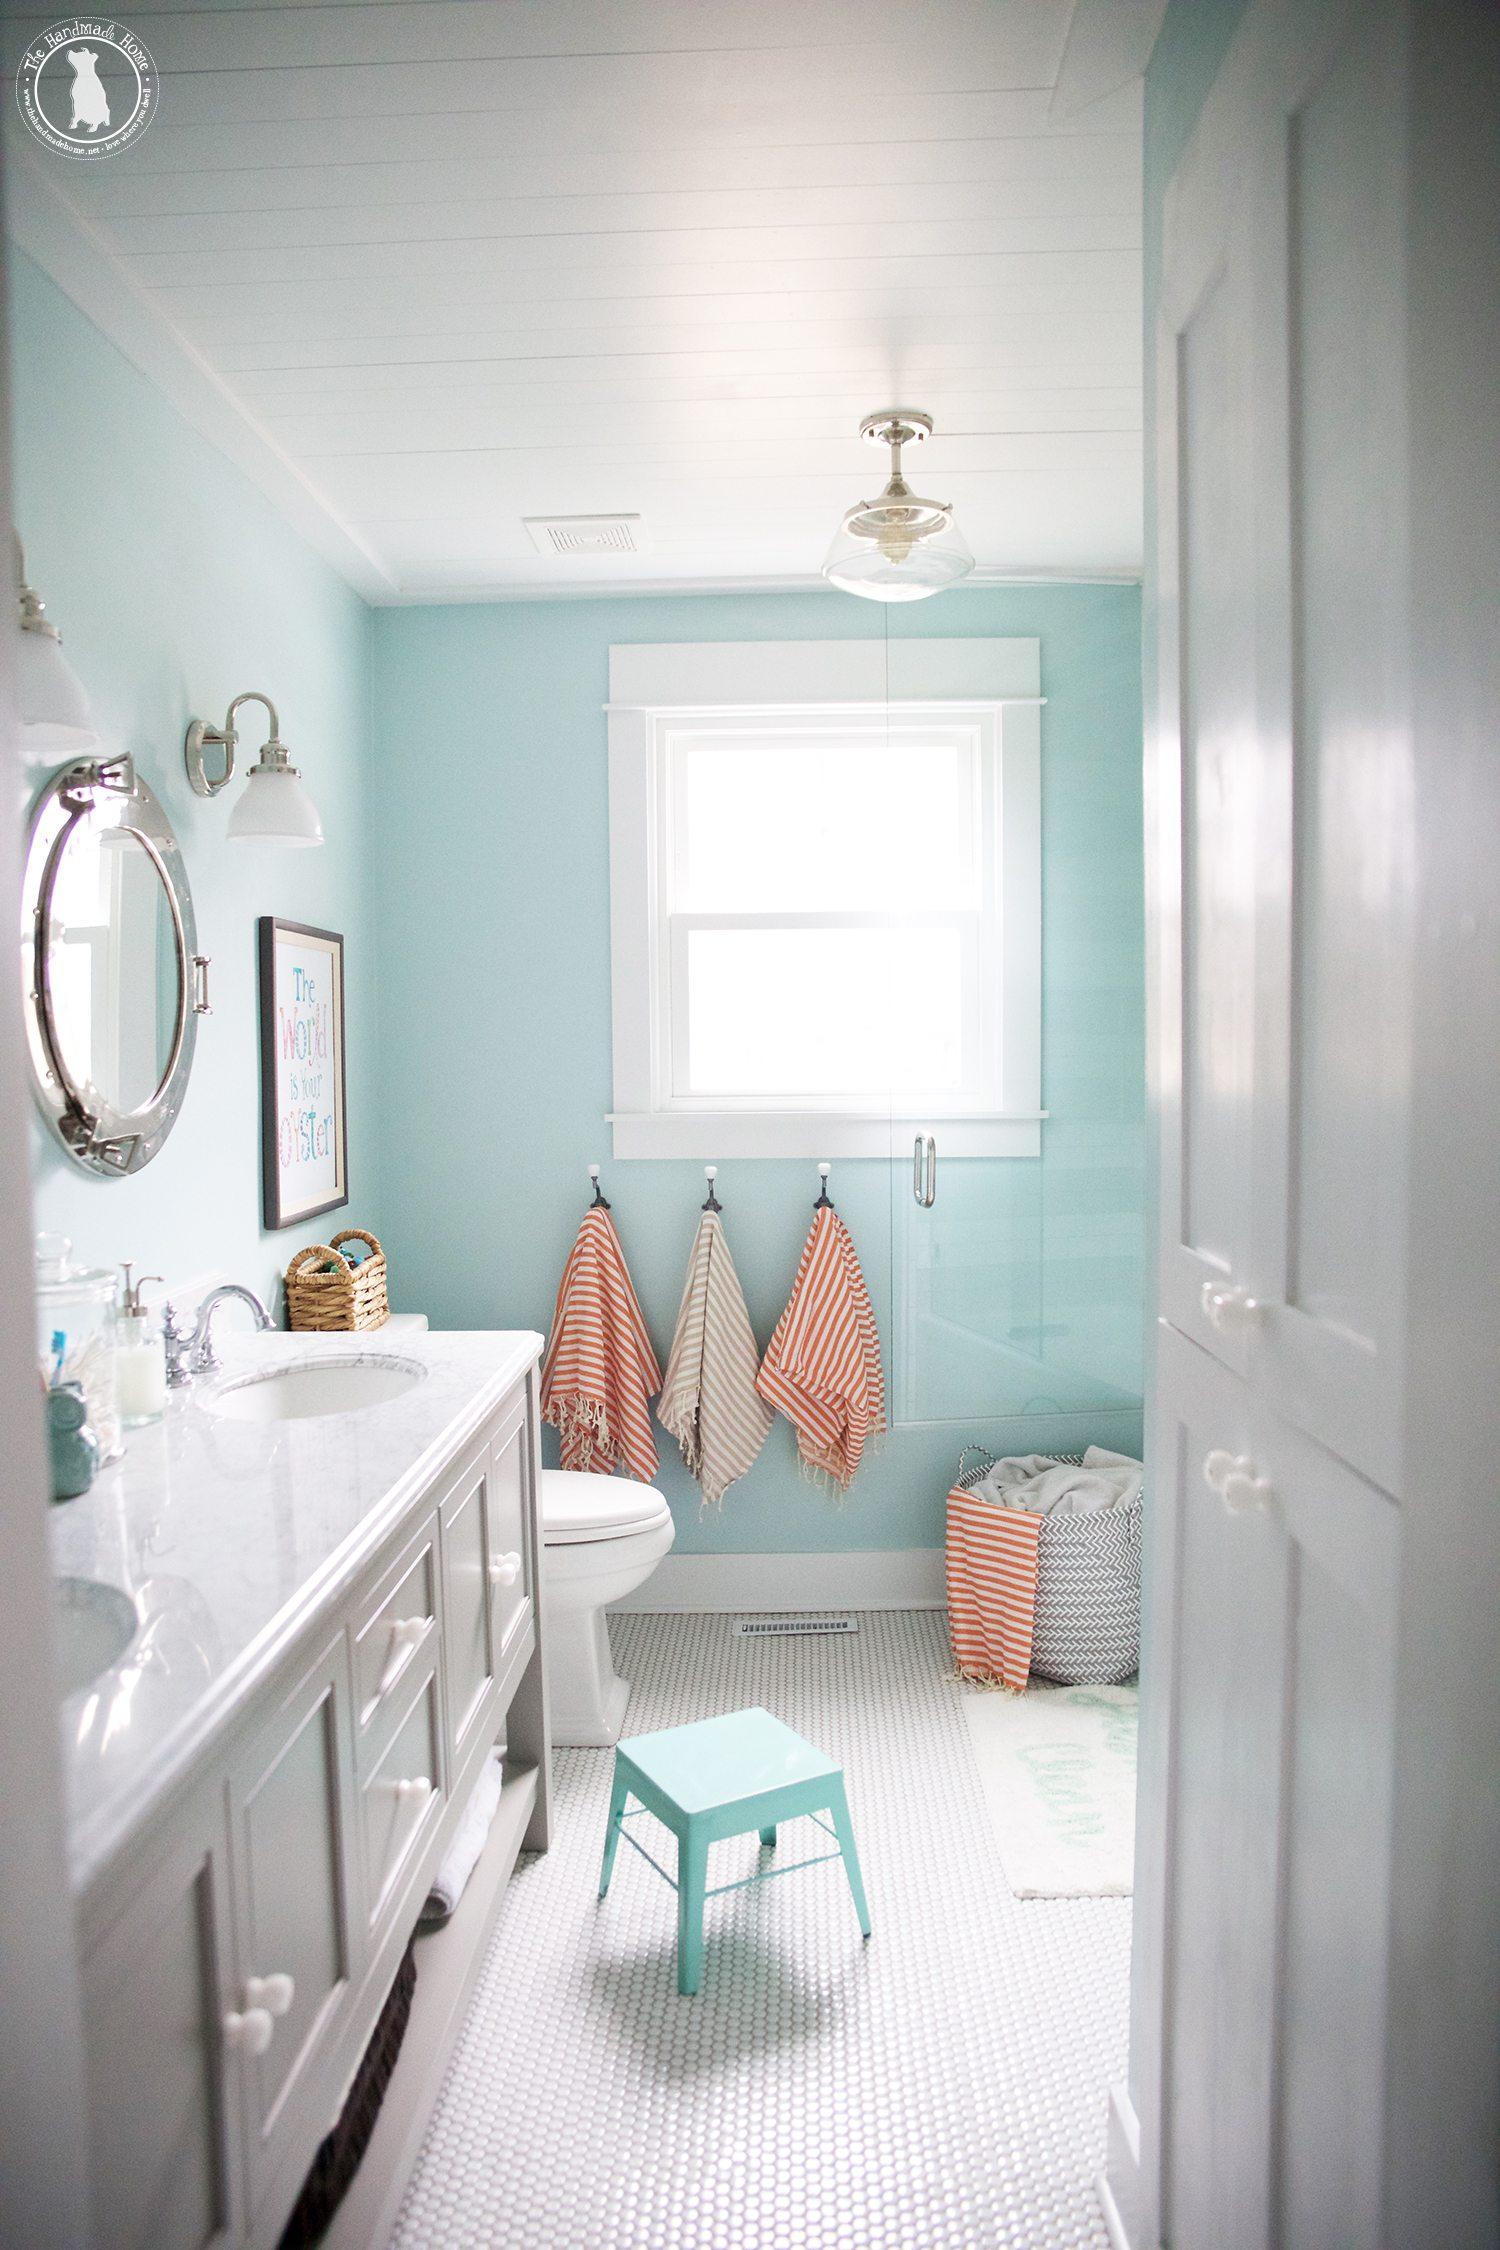 Useful Ideas For Decorating A Kids Bathroom